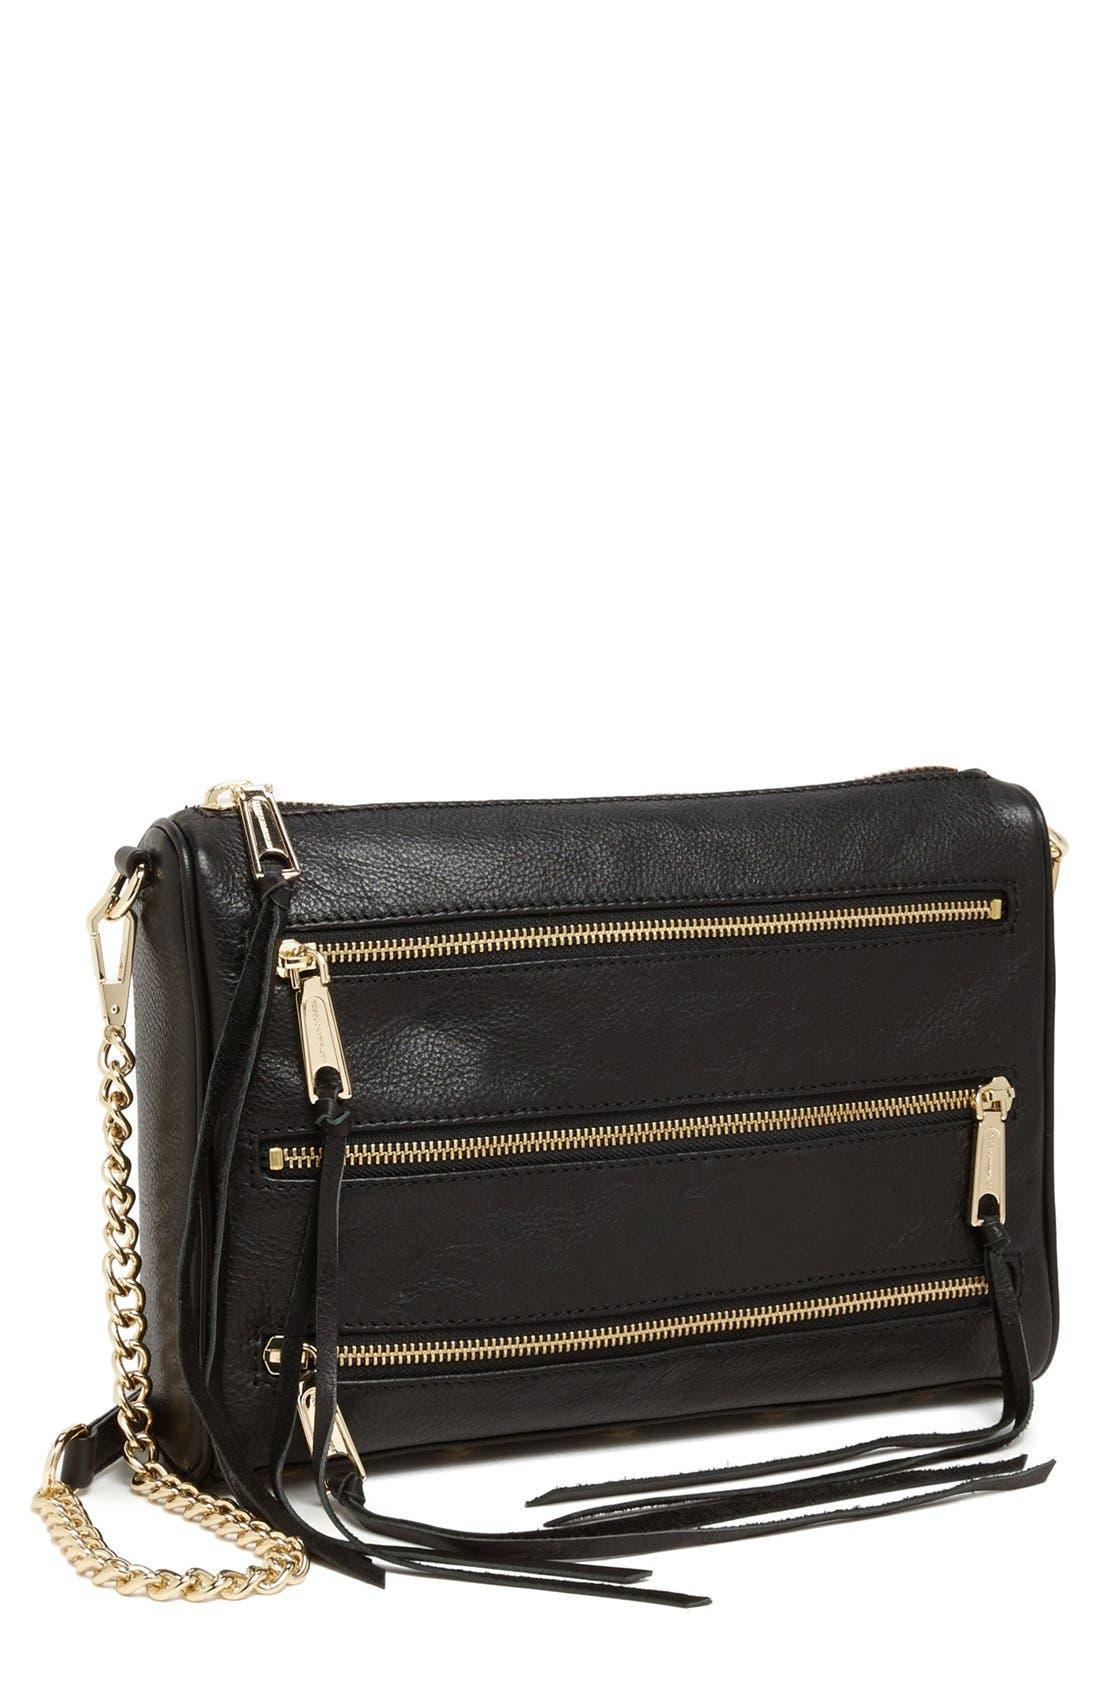 Alternate Image 1 Selected - Rebecca Minkoff '5-Zip' Crossbody Bag